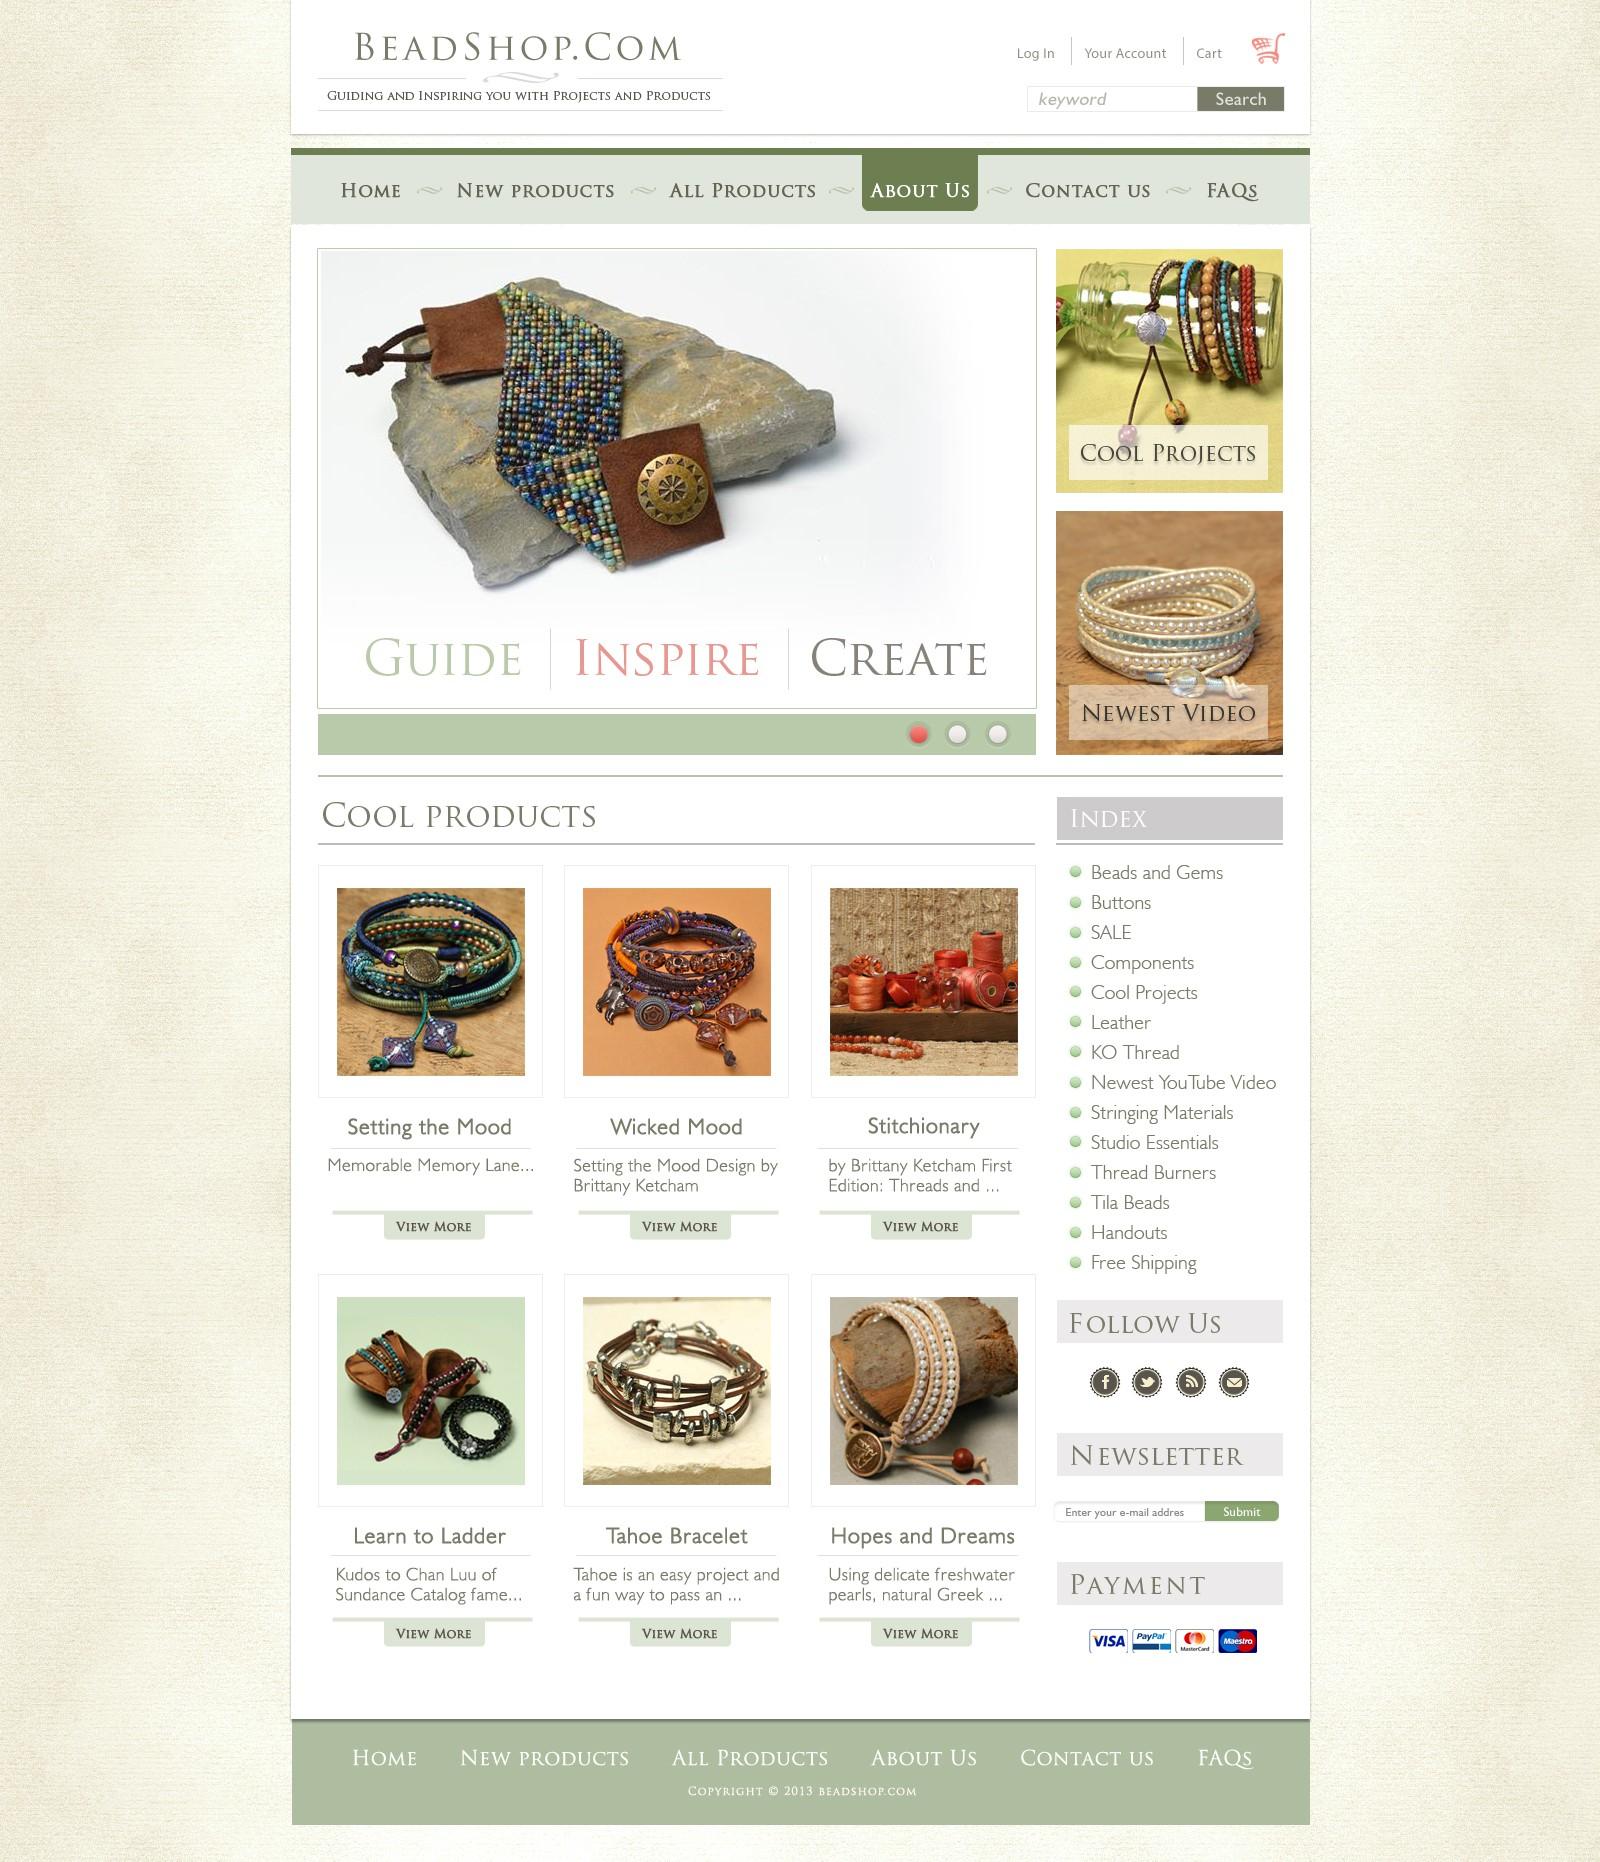 Top DIY beadshop.com needs new look for new platform!